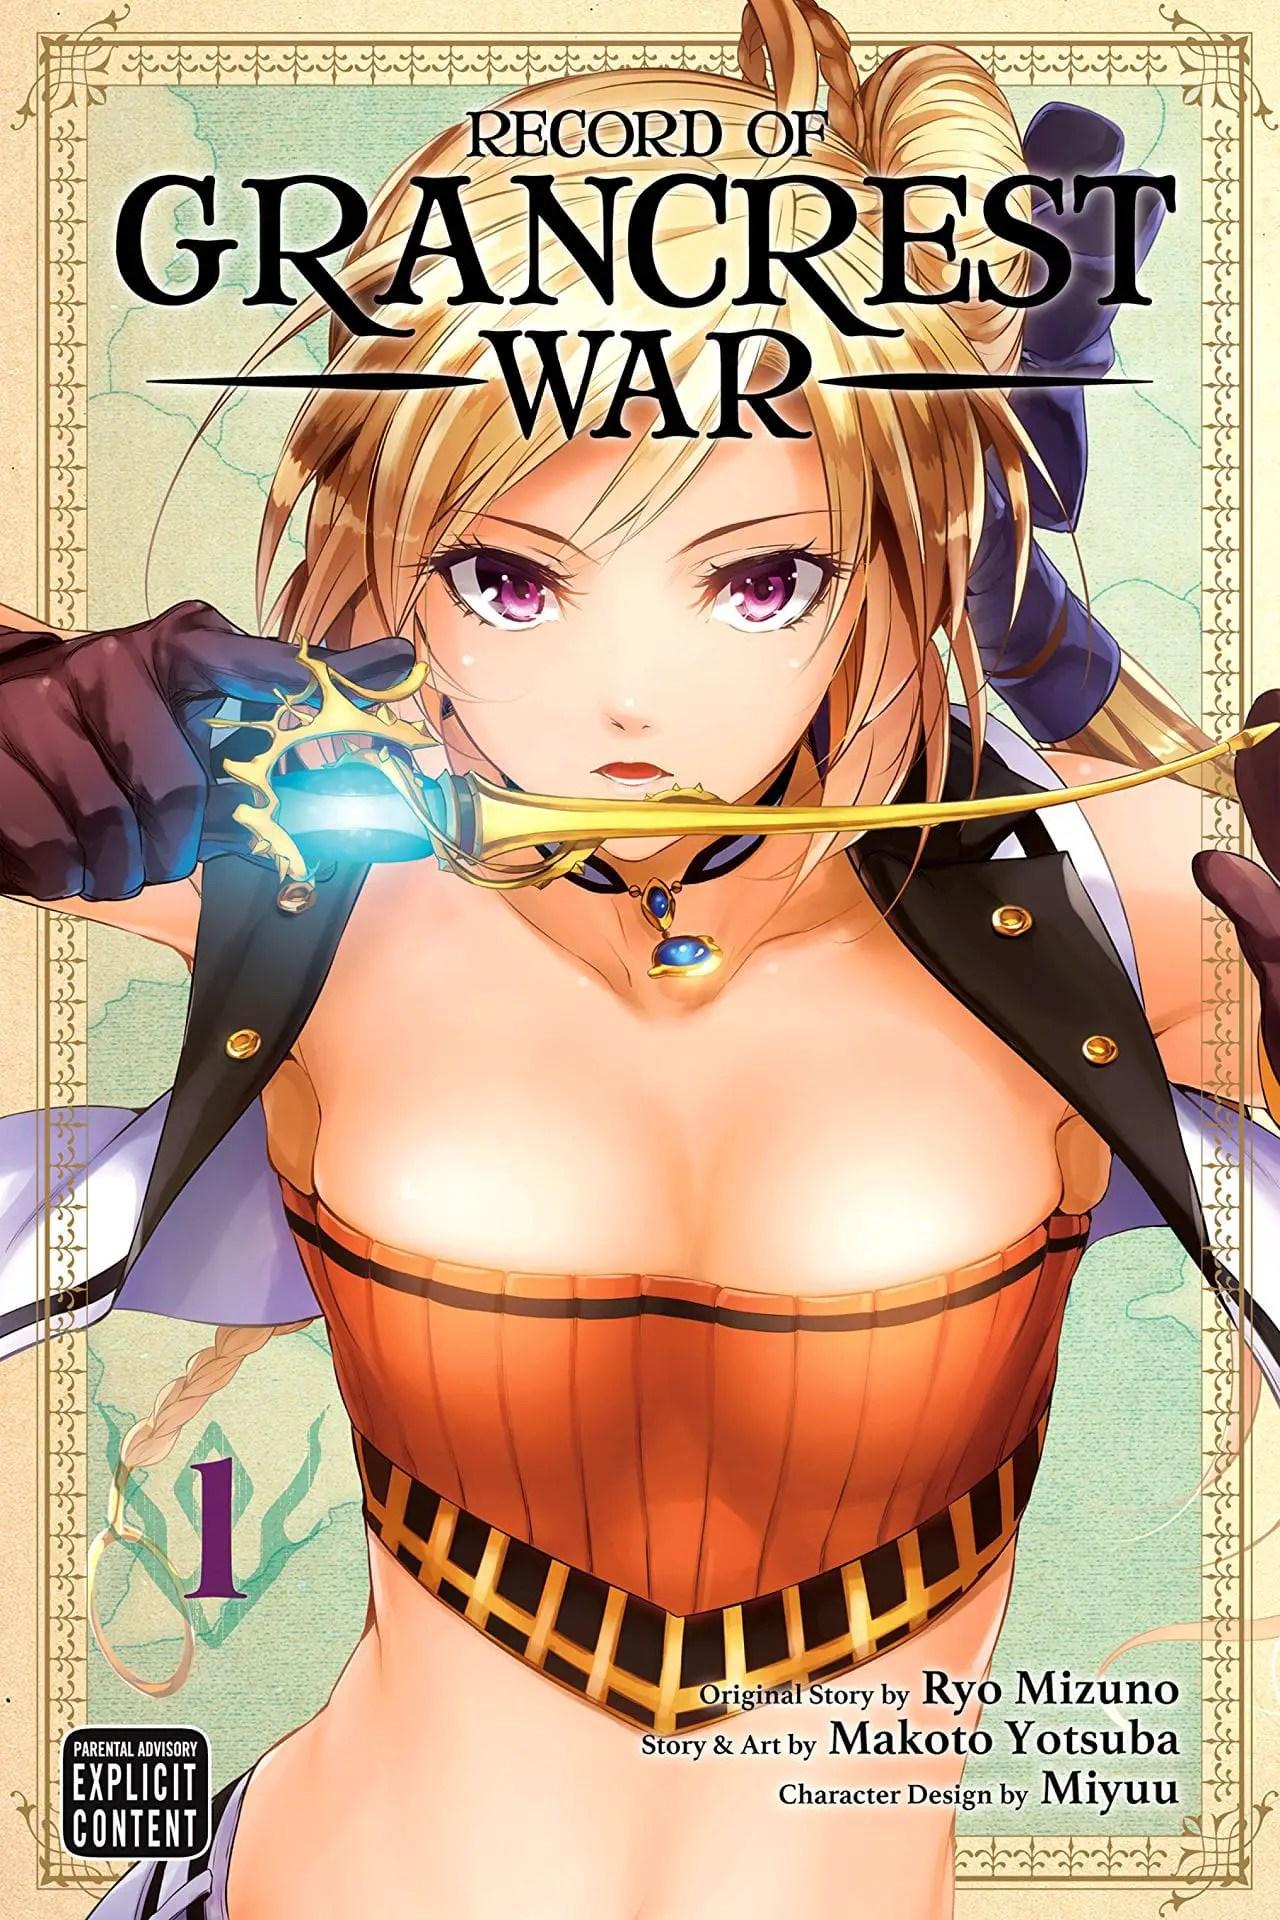 Record of Grancrest War Vol. 1 Review